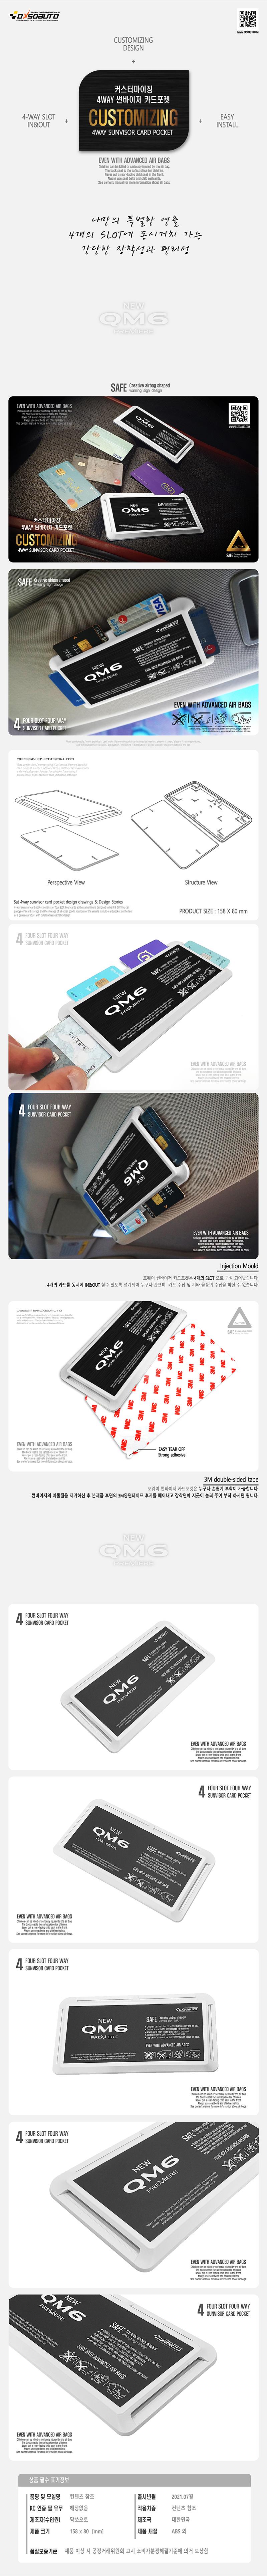 [DXSOAUTO] 커스터마이징 4WAY 썬바이저 카드포켓 (1EA / 1SET) 뉴 QM6 화이트